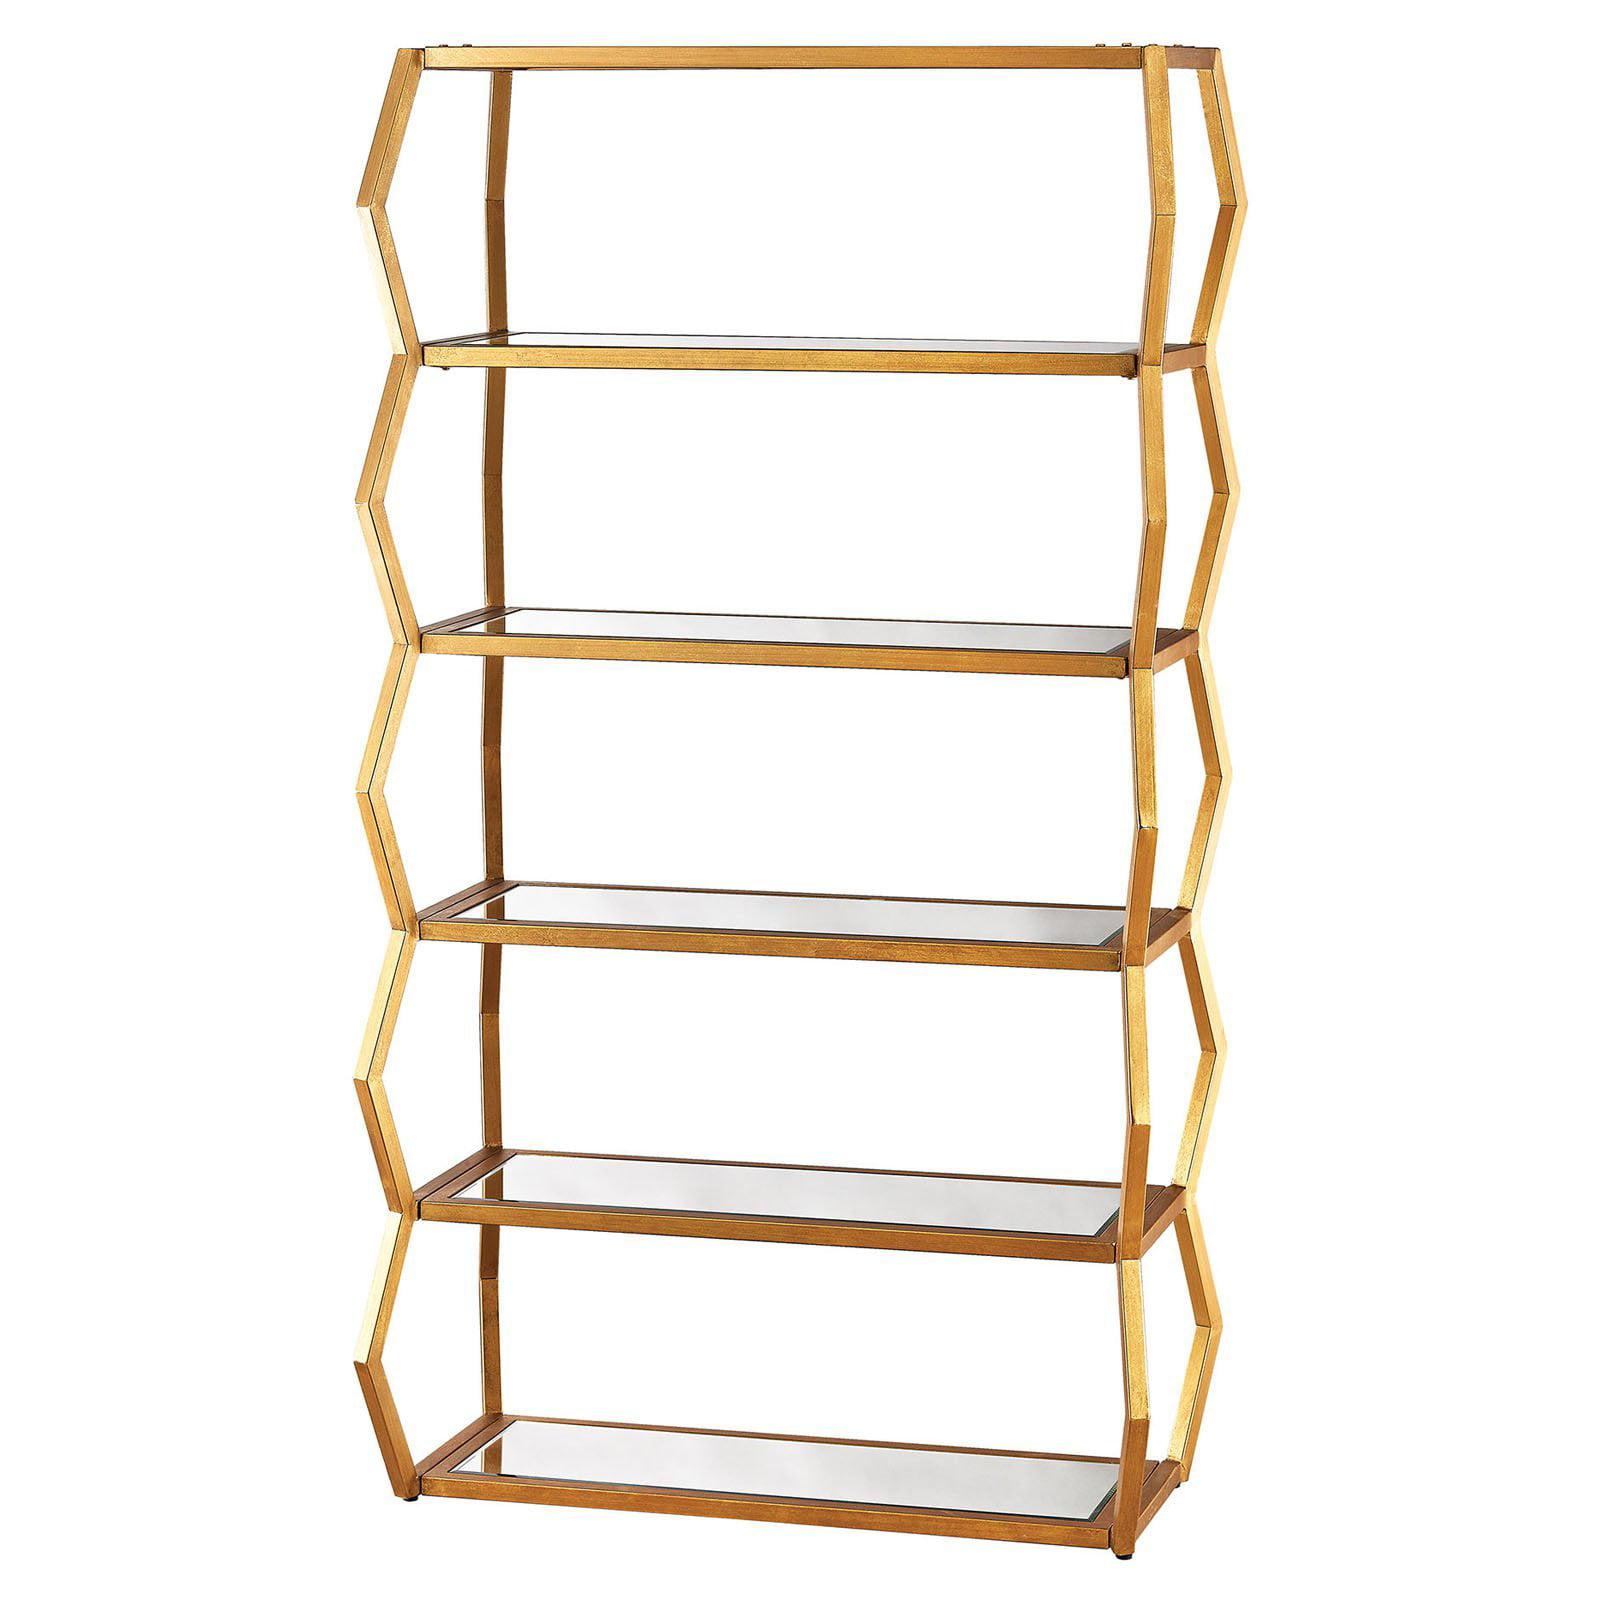 Dimond Home Anjelica Bookcase by Dimond Home